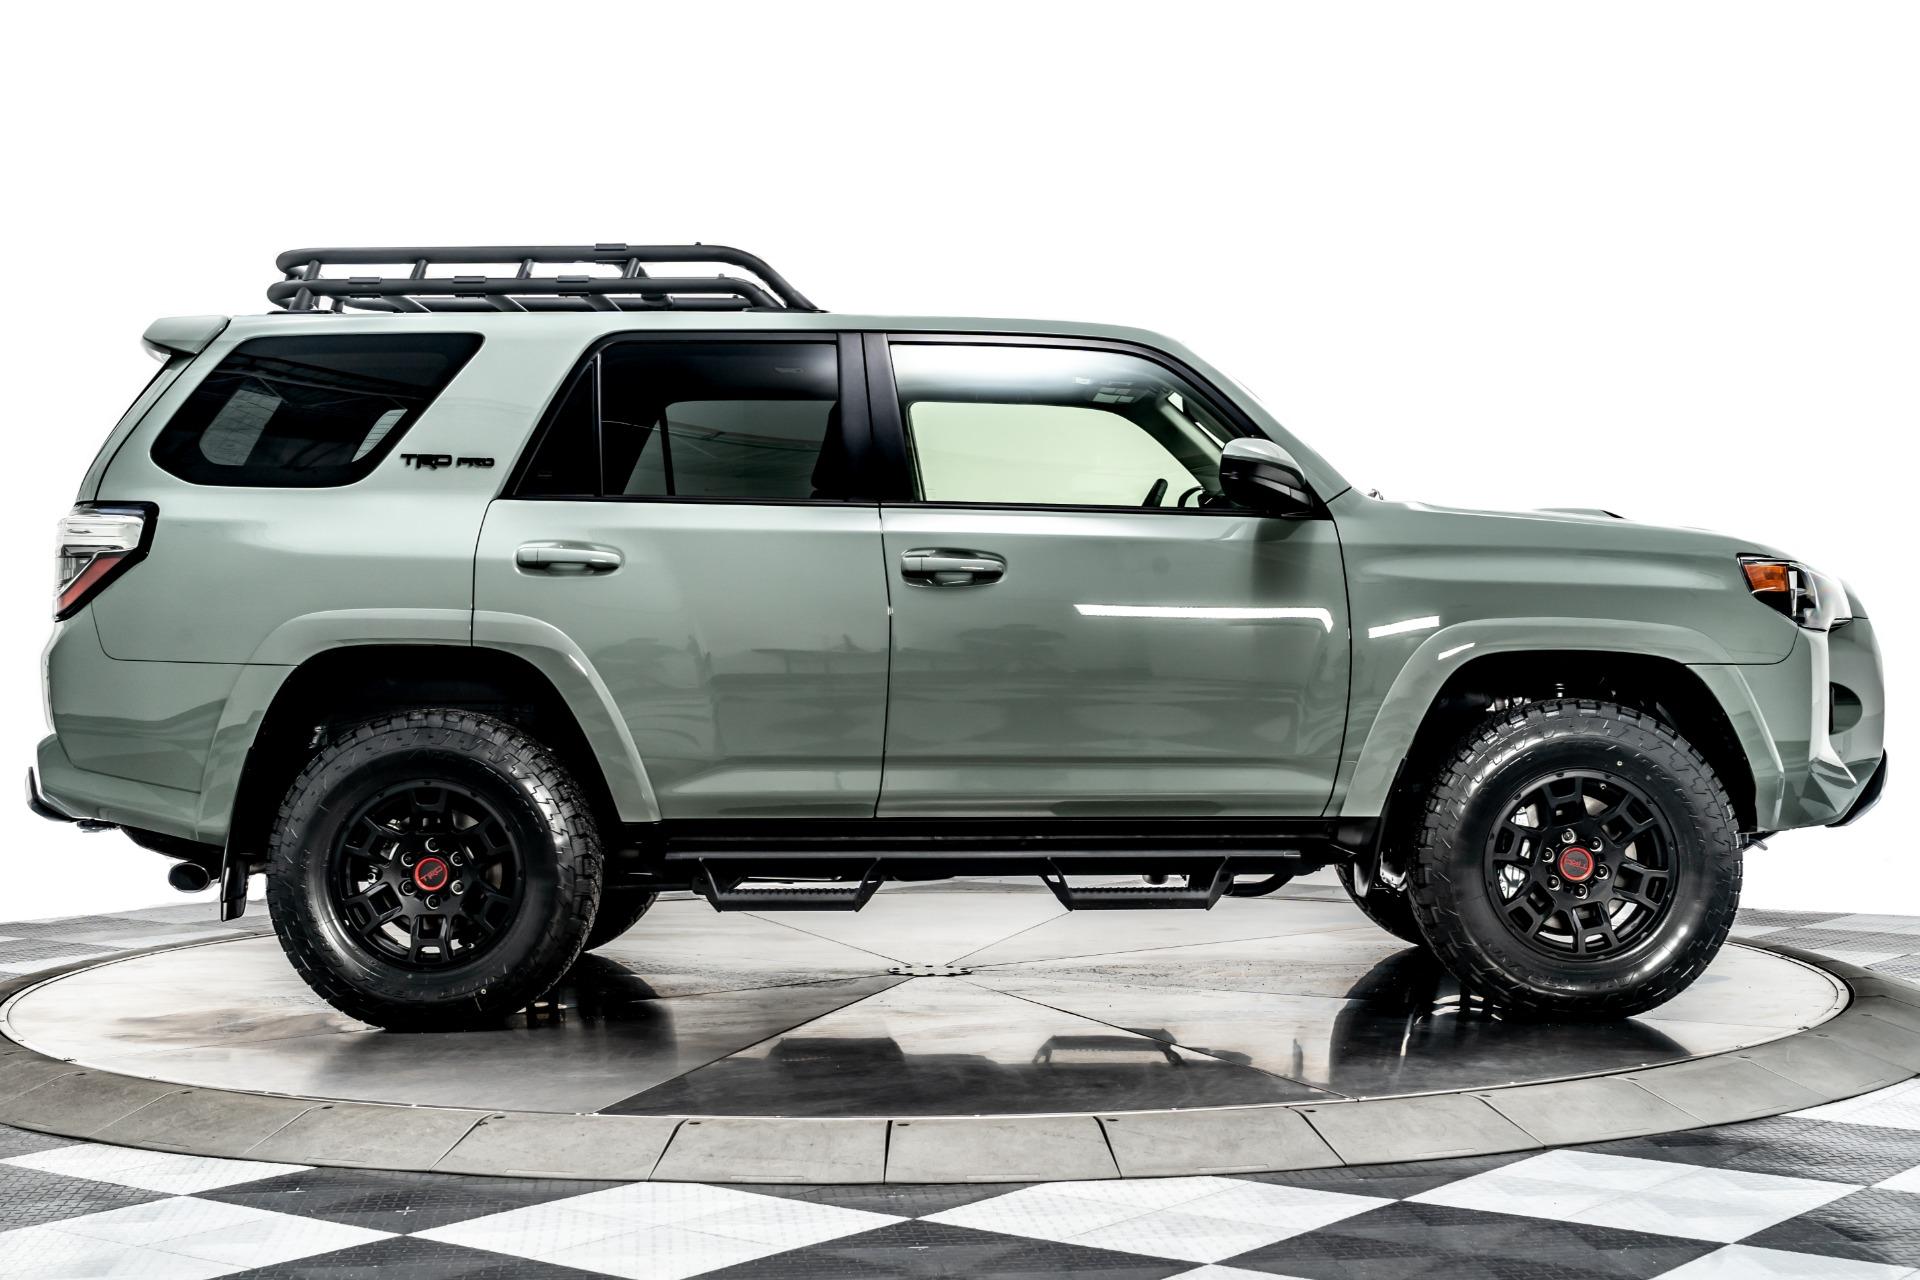 2017 toyota 4runner trd off road premium 4x4 4wd four sku:h5472332. Used 2021 Toyota 4runner Trd Pro For Sale Sold Marshall Goldman Cleveland Stock Wtrdgr